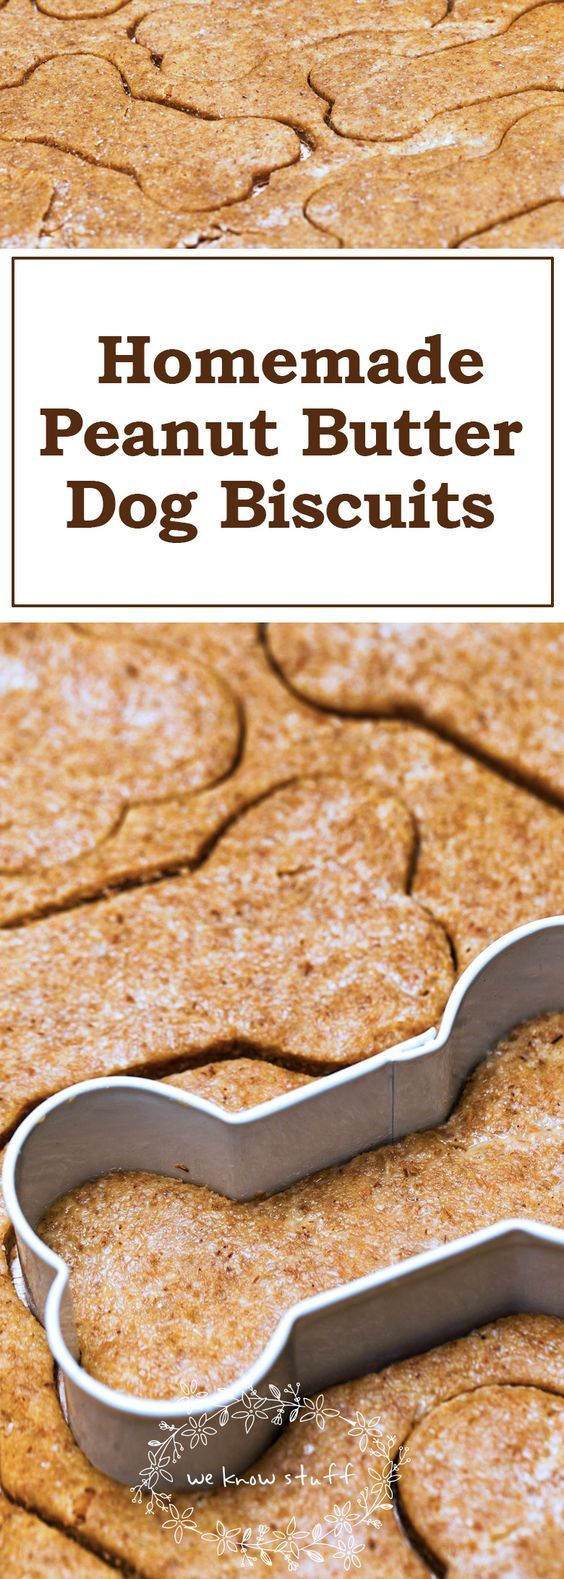 Dog Treats Handmade By Muddy Puppys Gourmet Homemade All Natural